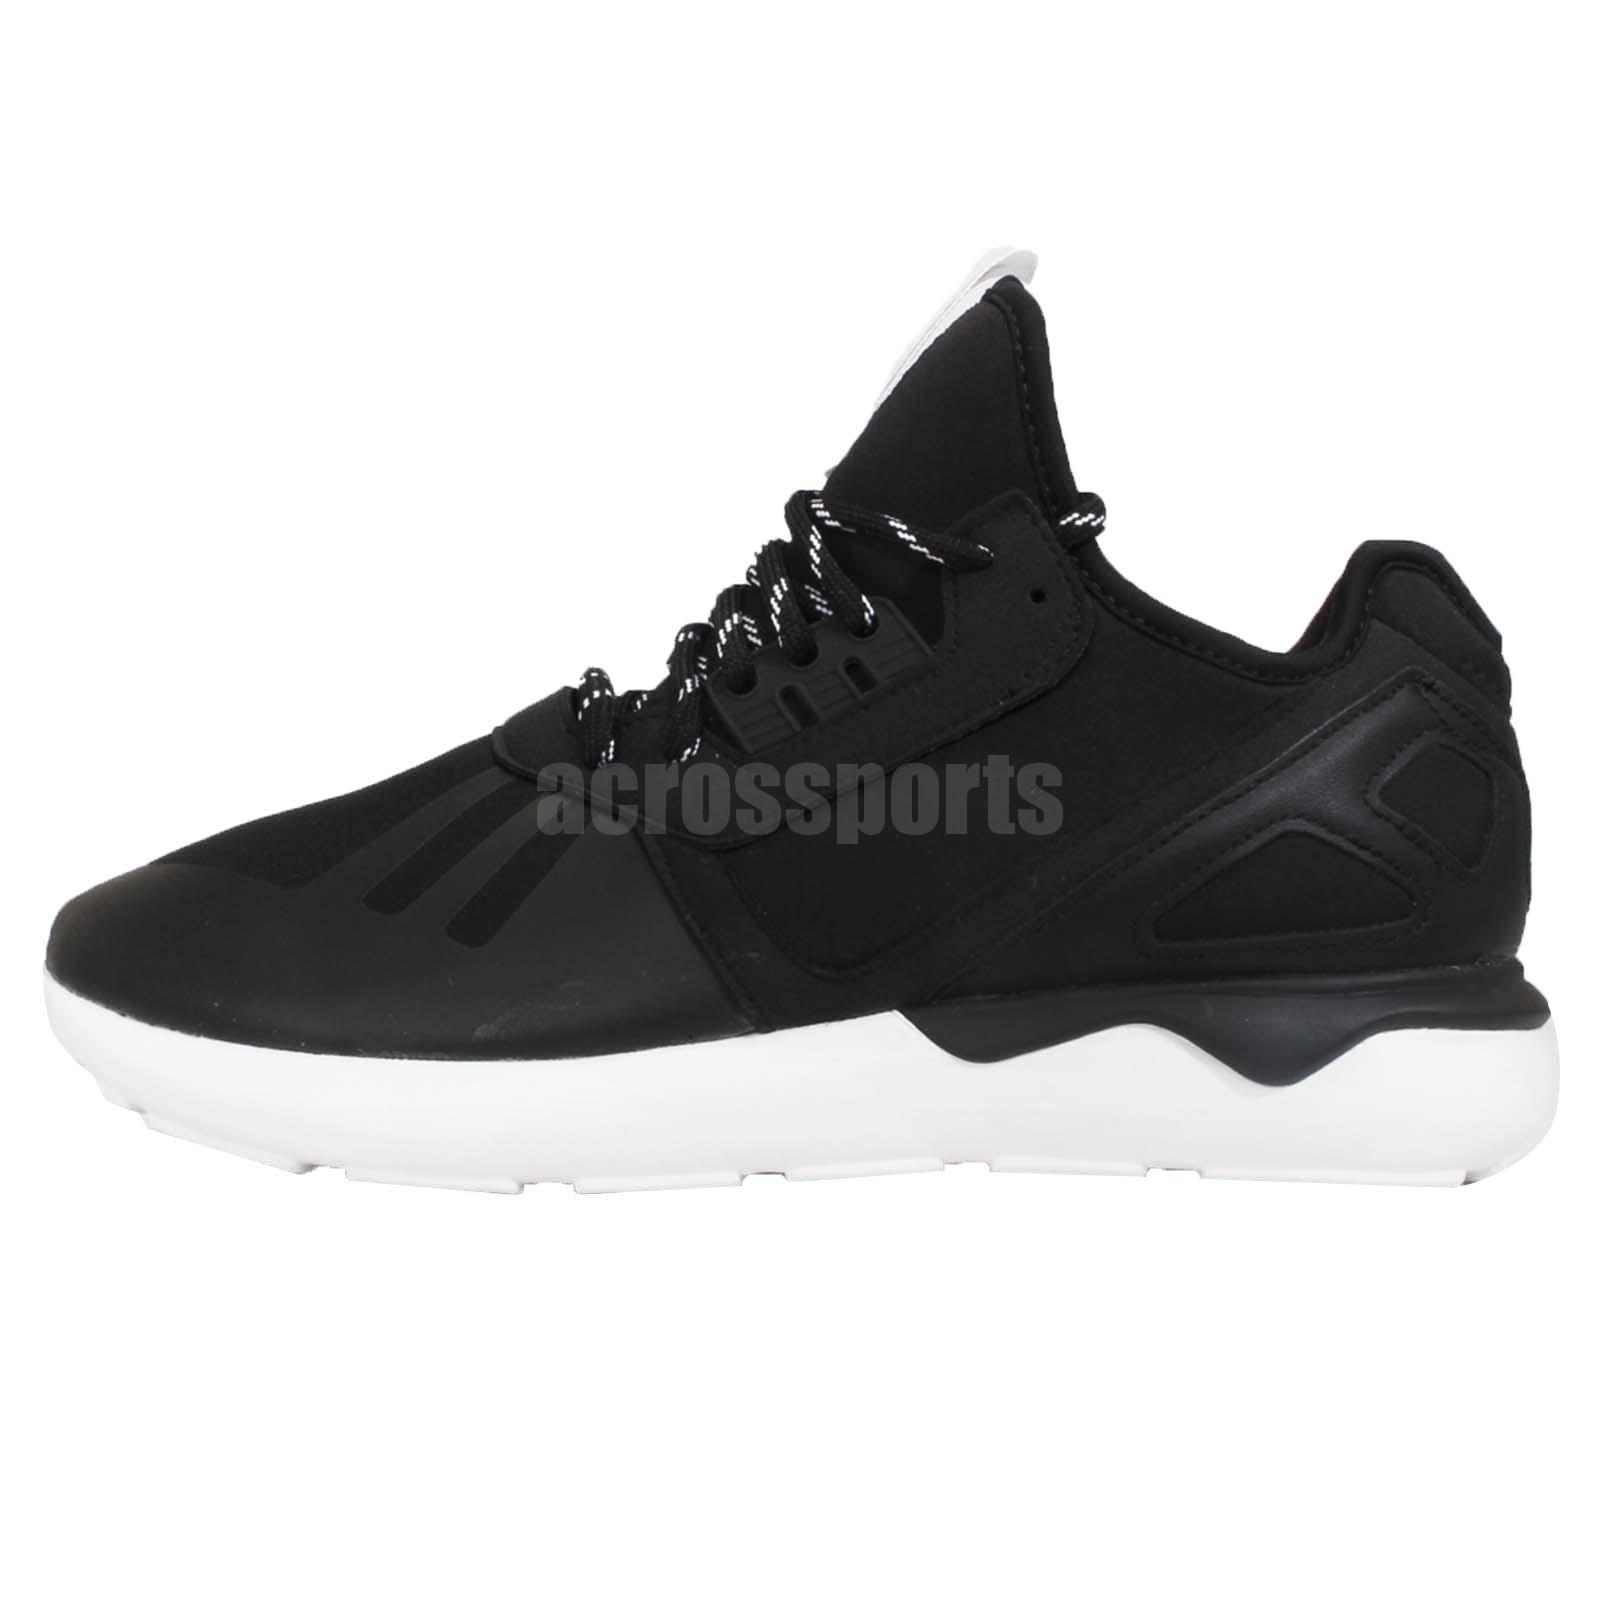 meet 98b88 5d08f adidas Originals Tubular Runner Black Mens Running Shoes Sneakers Y3 M19648